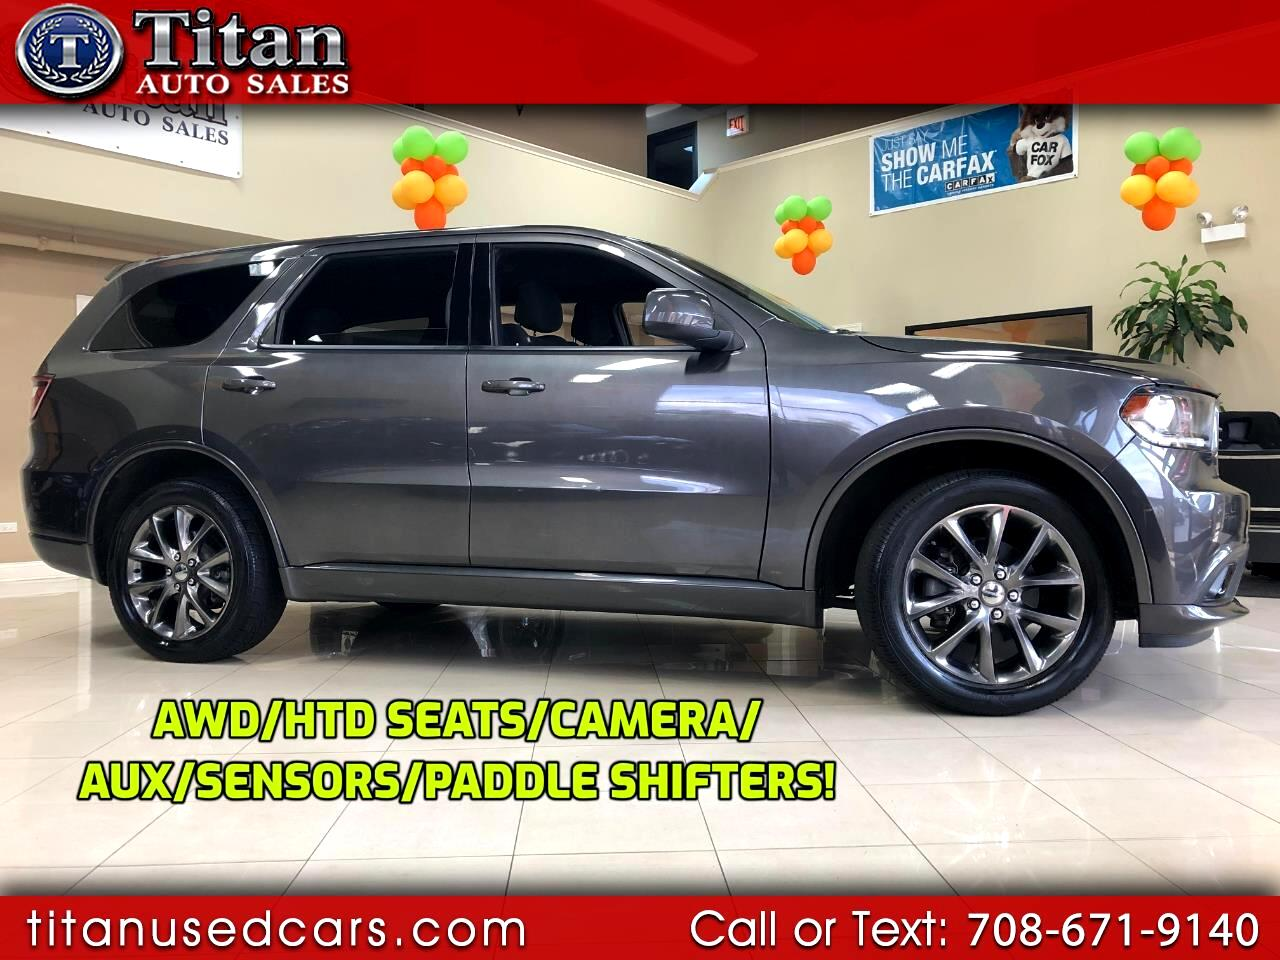 2014 Dodge Durango SXT AWD